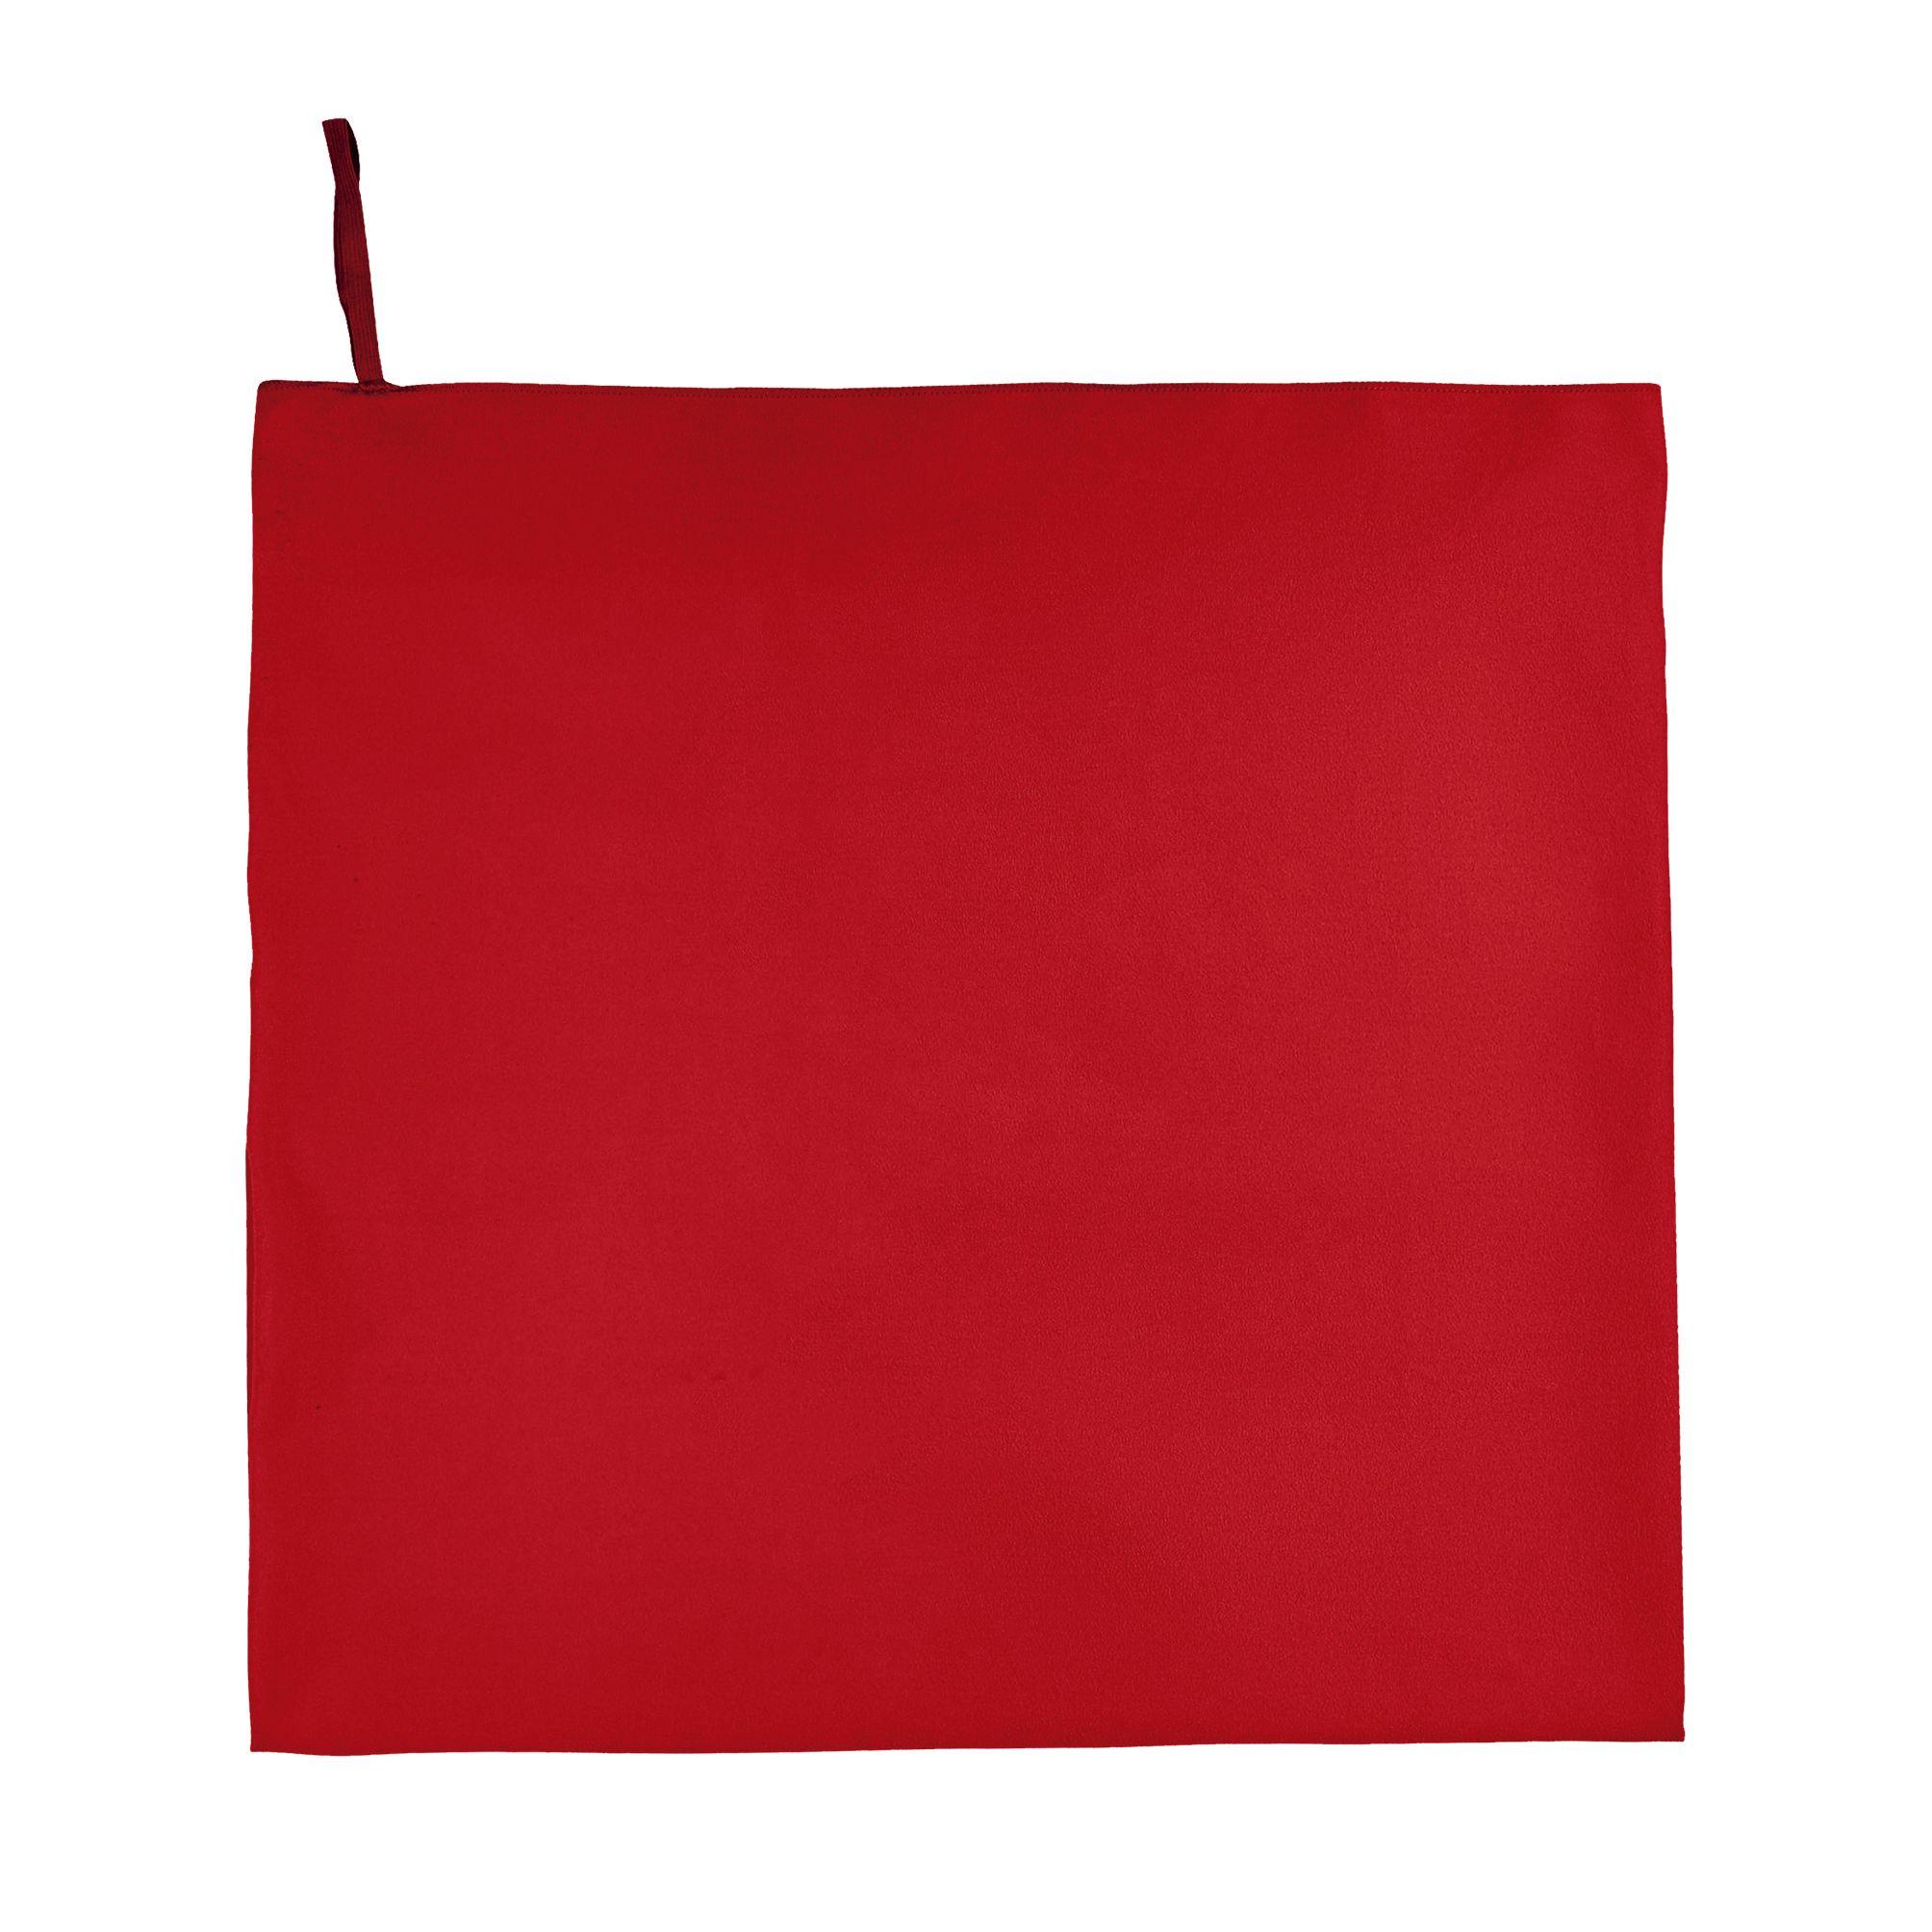 145 - Rojo